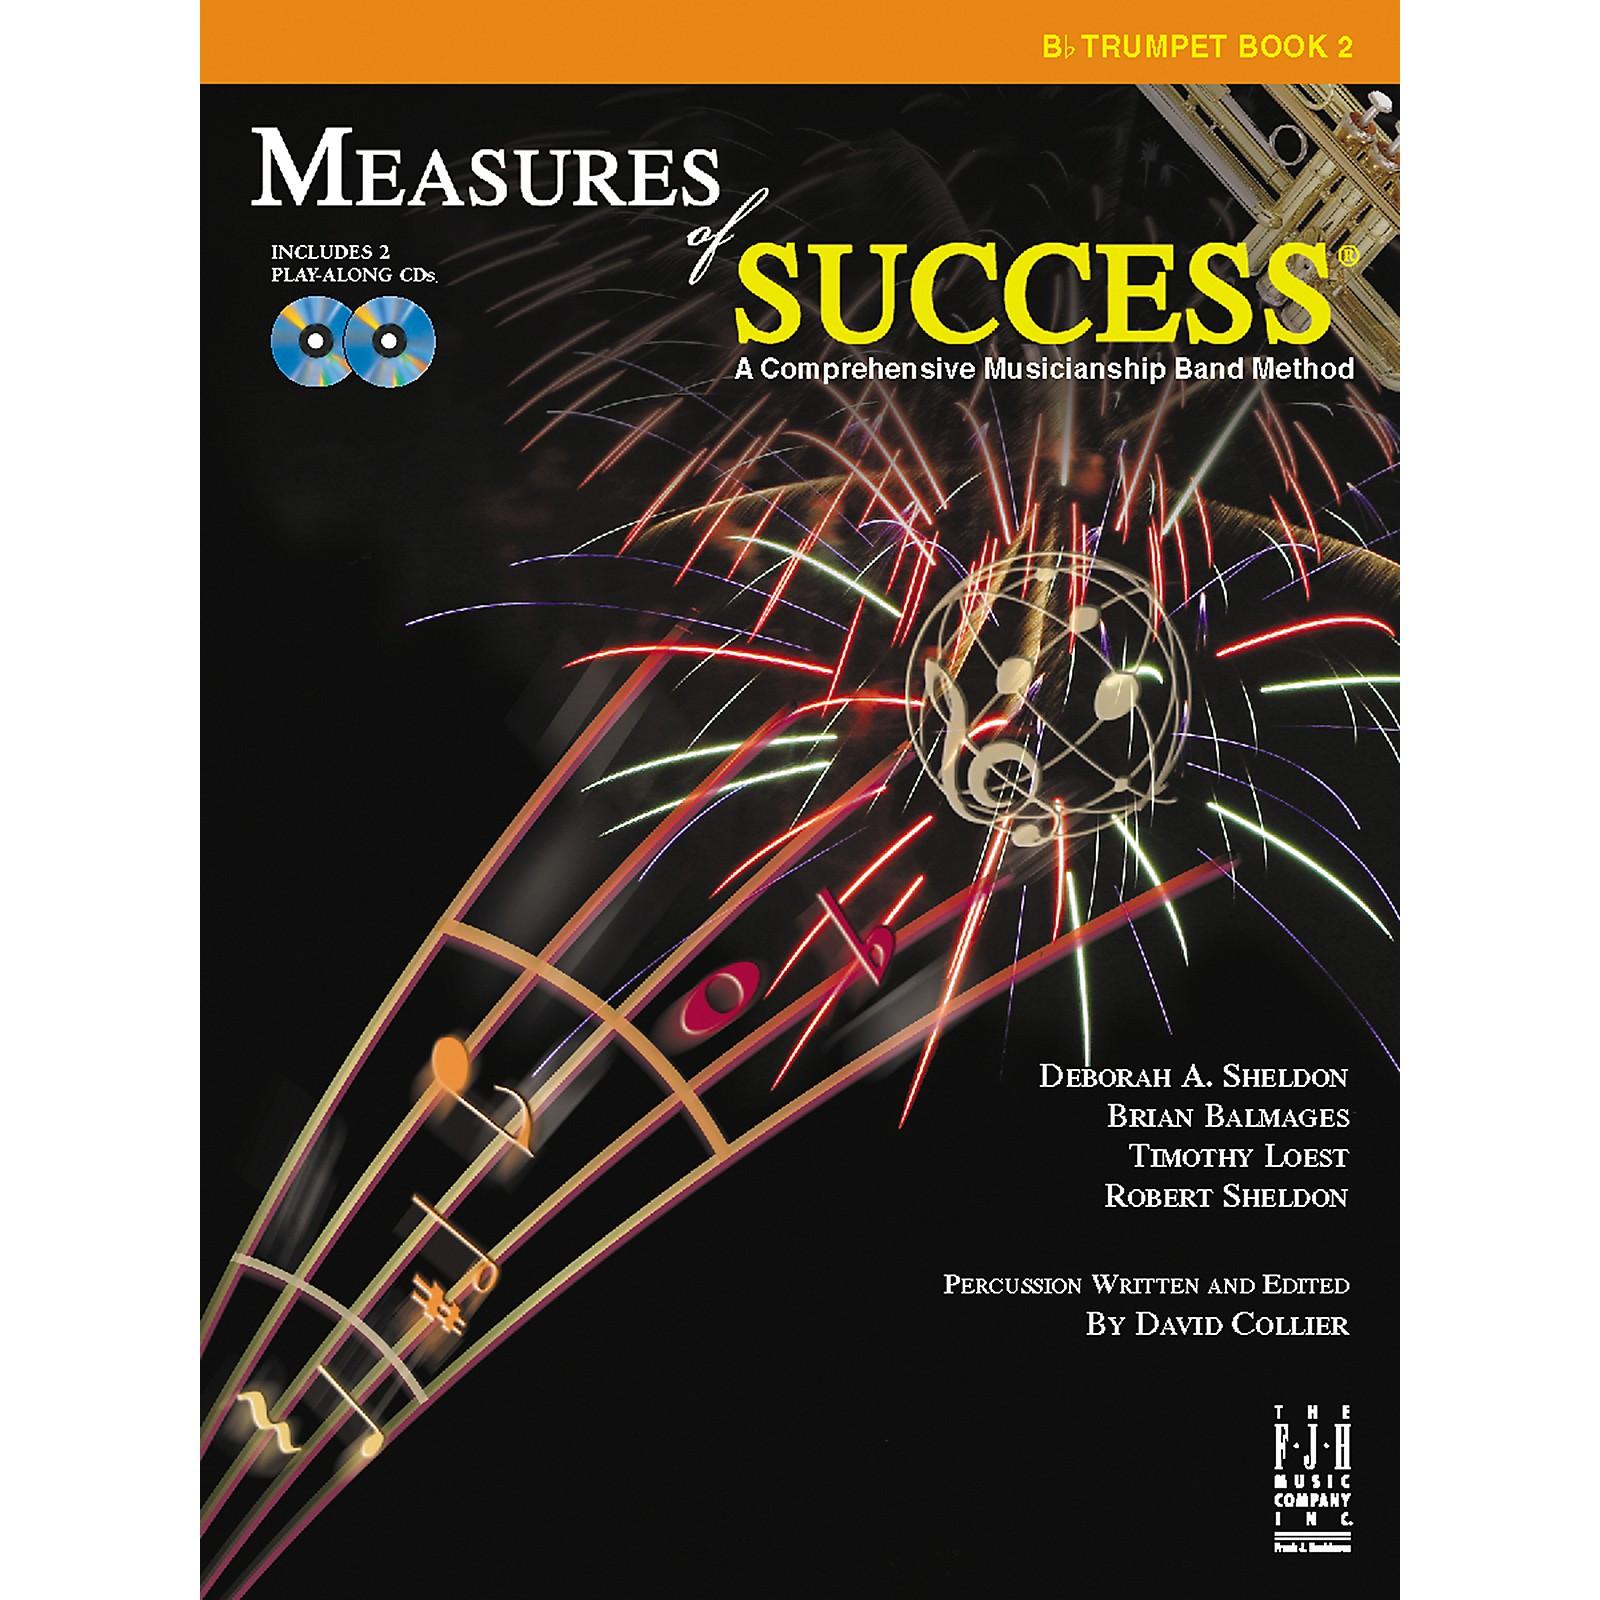 FJH Music Measures of Success Trumpet Book 2